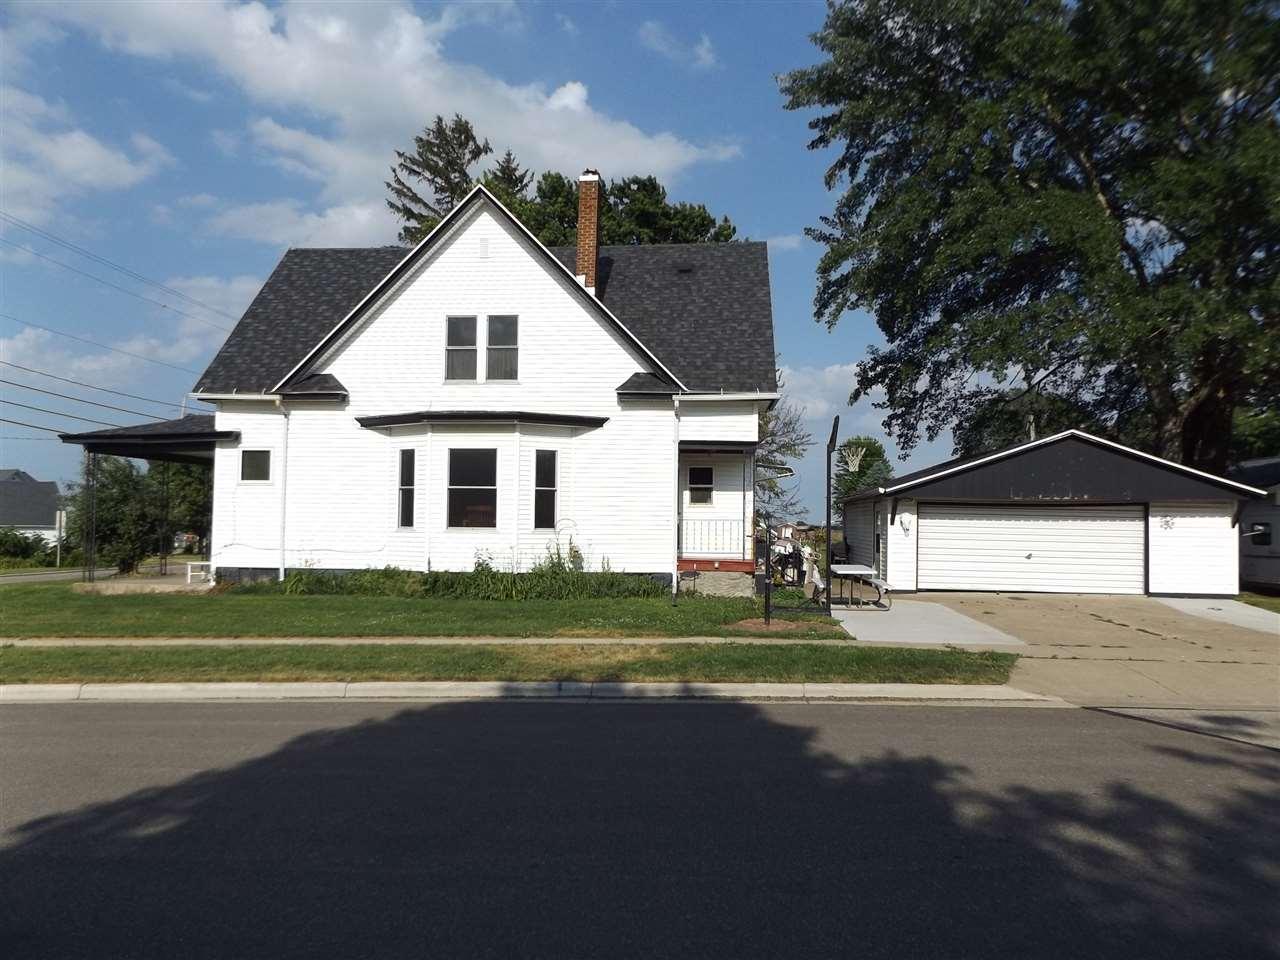 120 W County Road E, Livingston, WI 53554